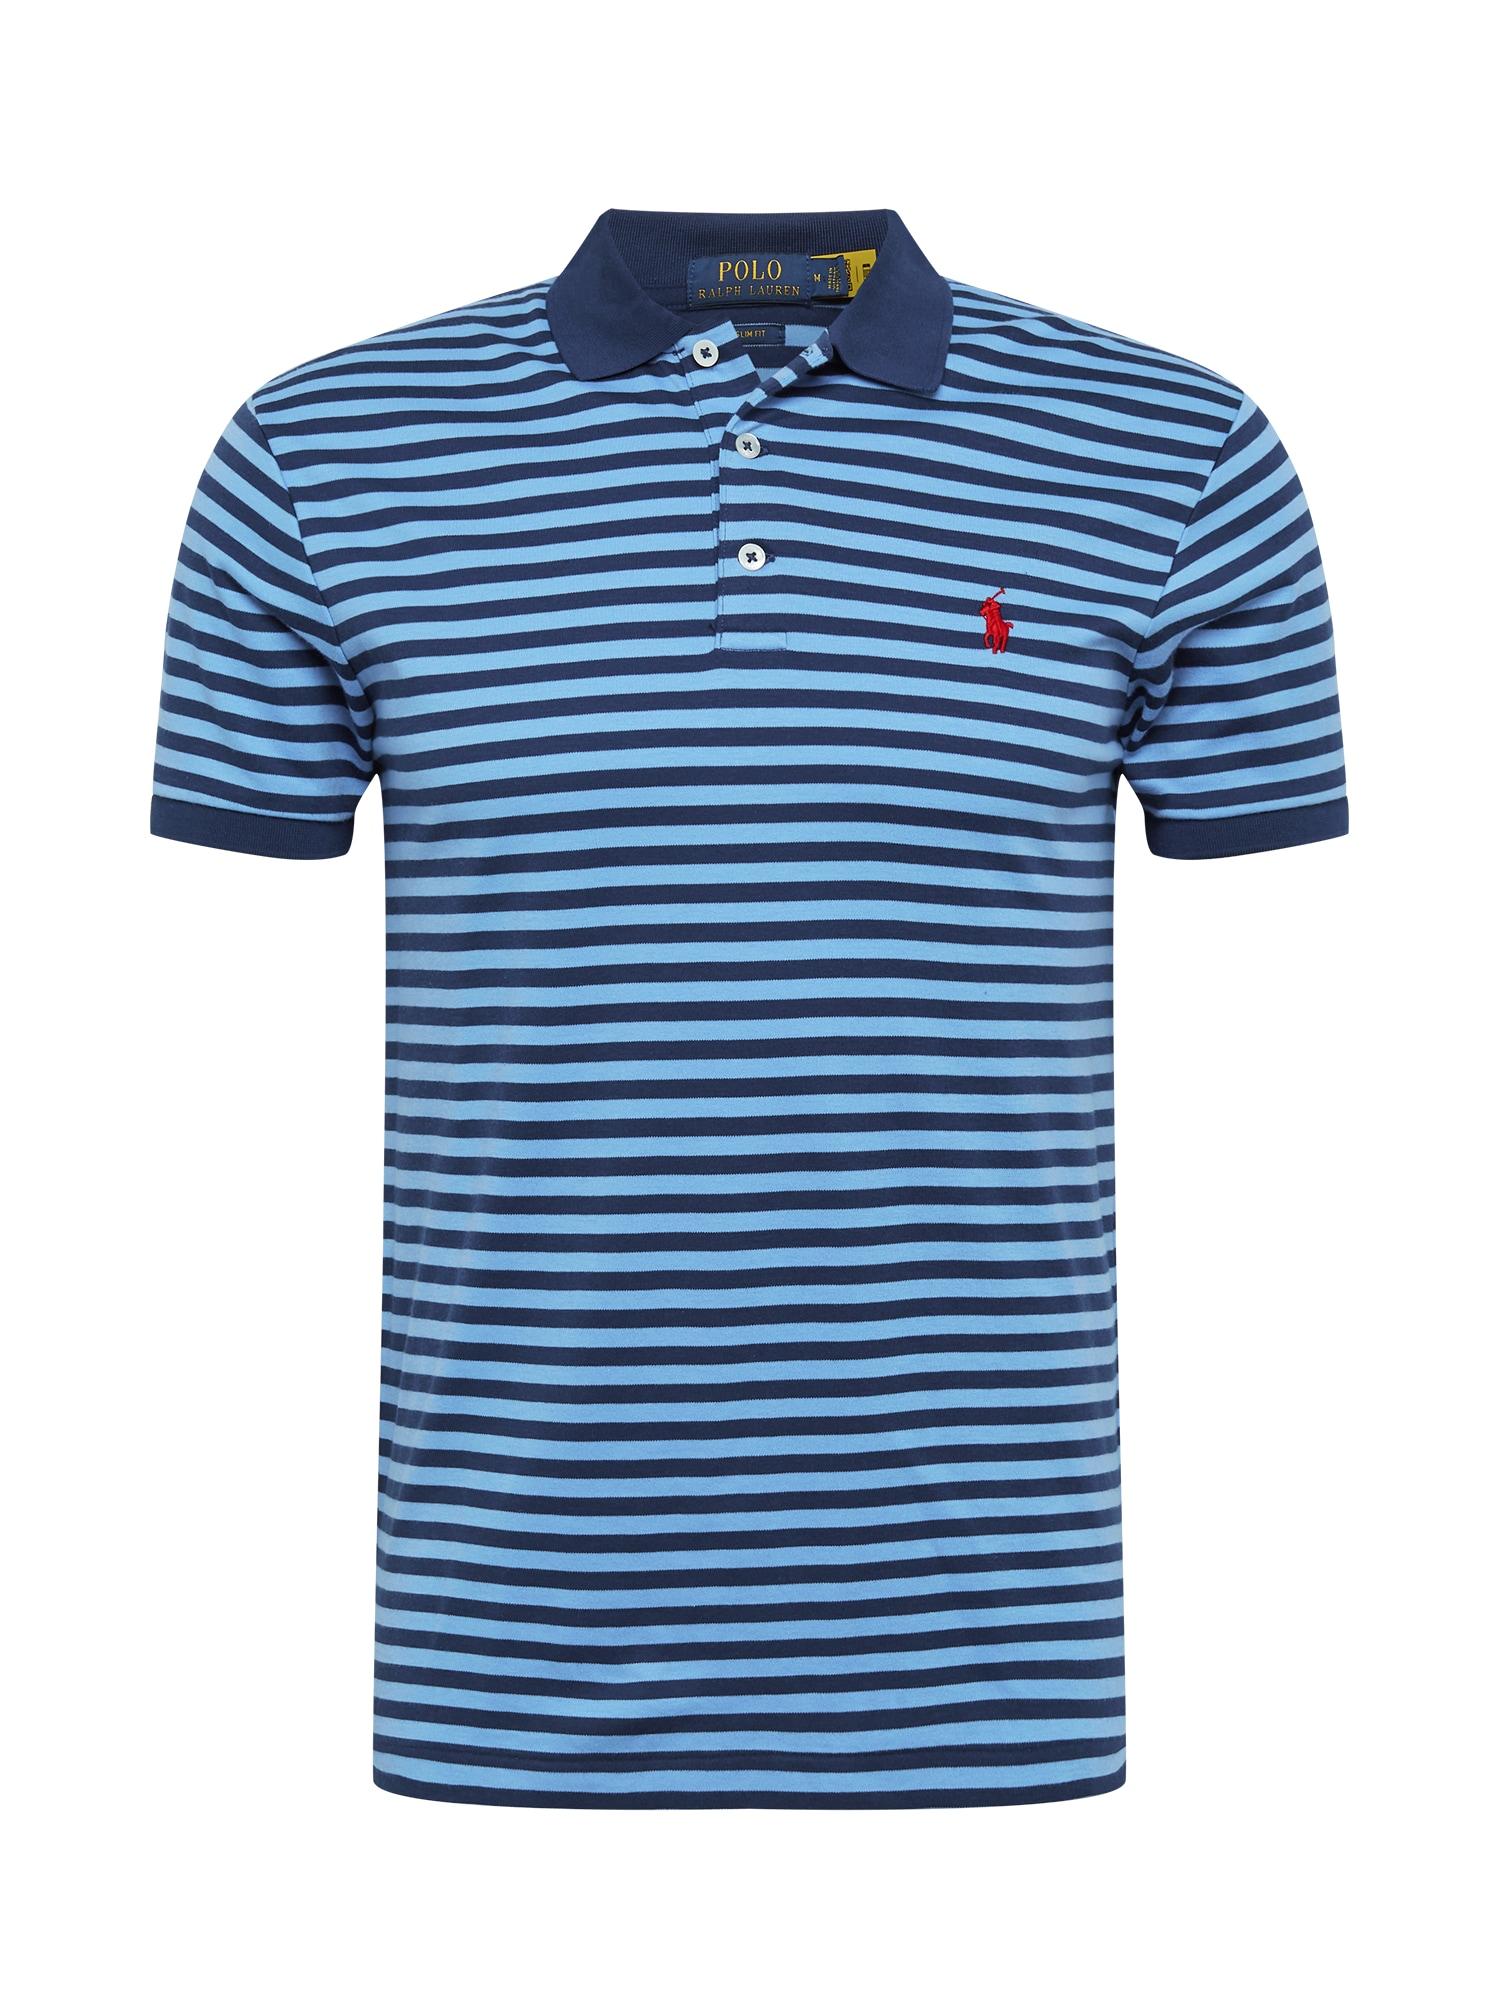 POLO RALPH LAUREN Marškinėliai mėlyna / šviesiai mėlyna